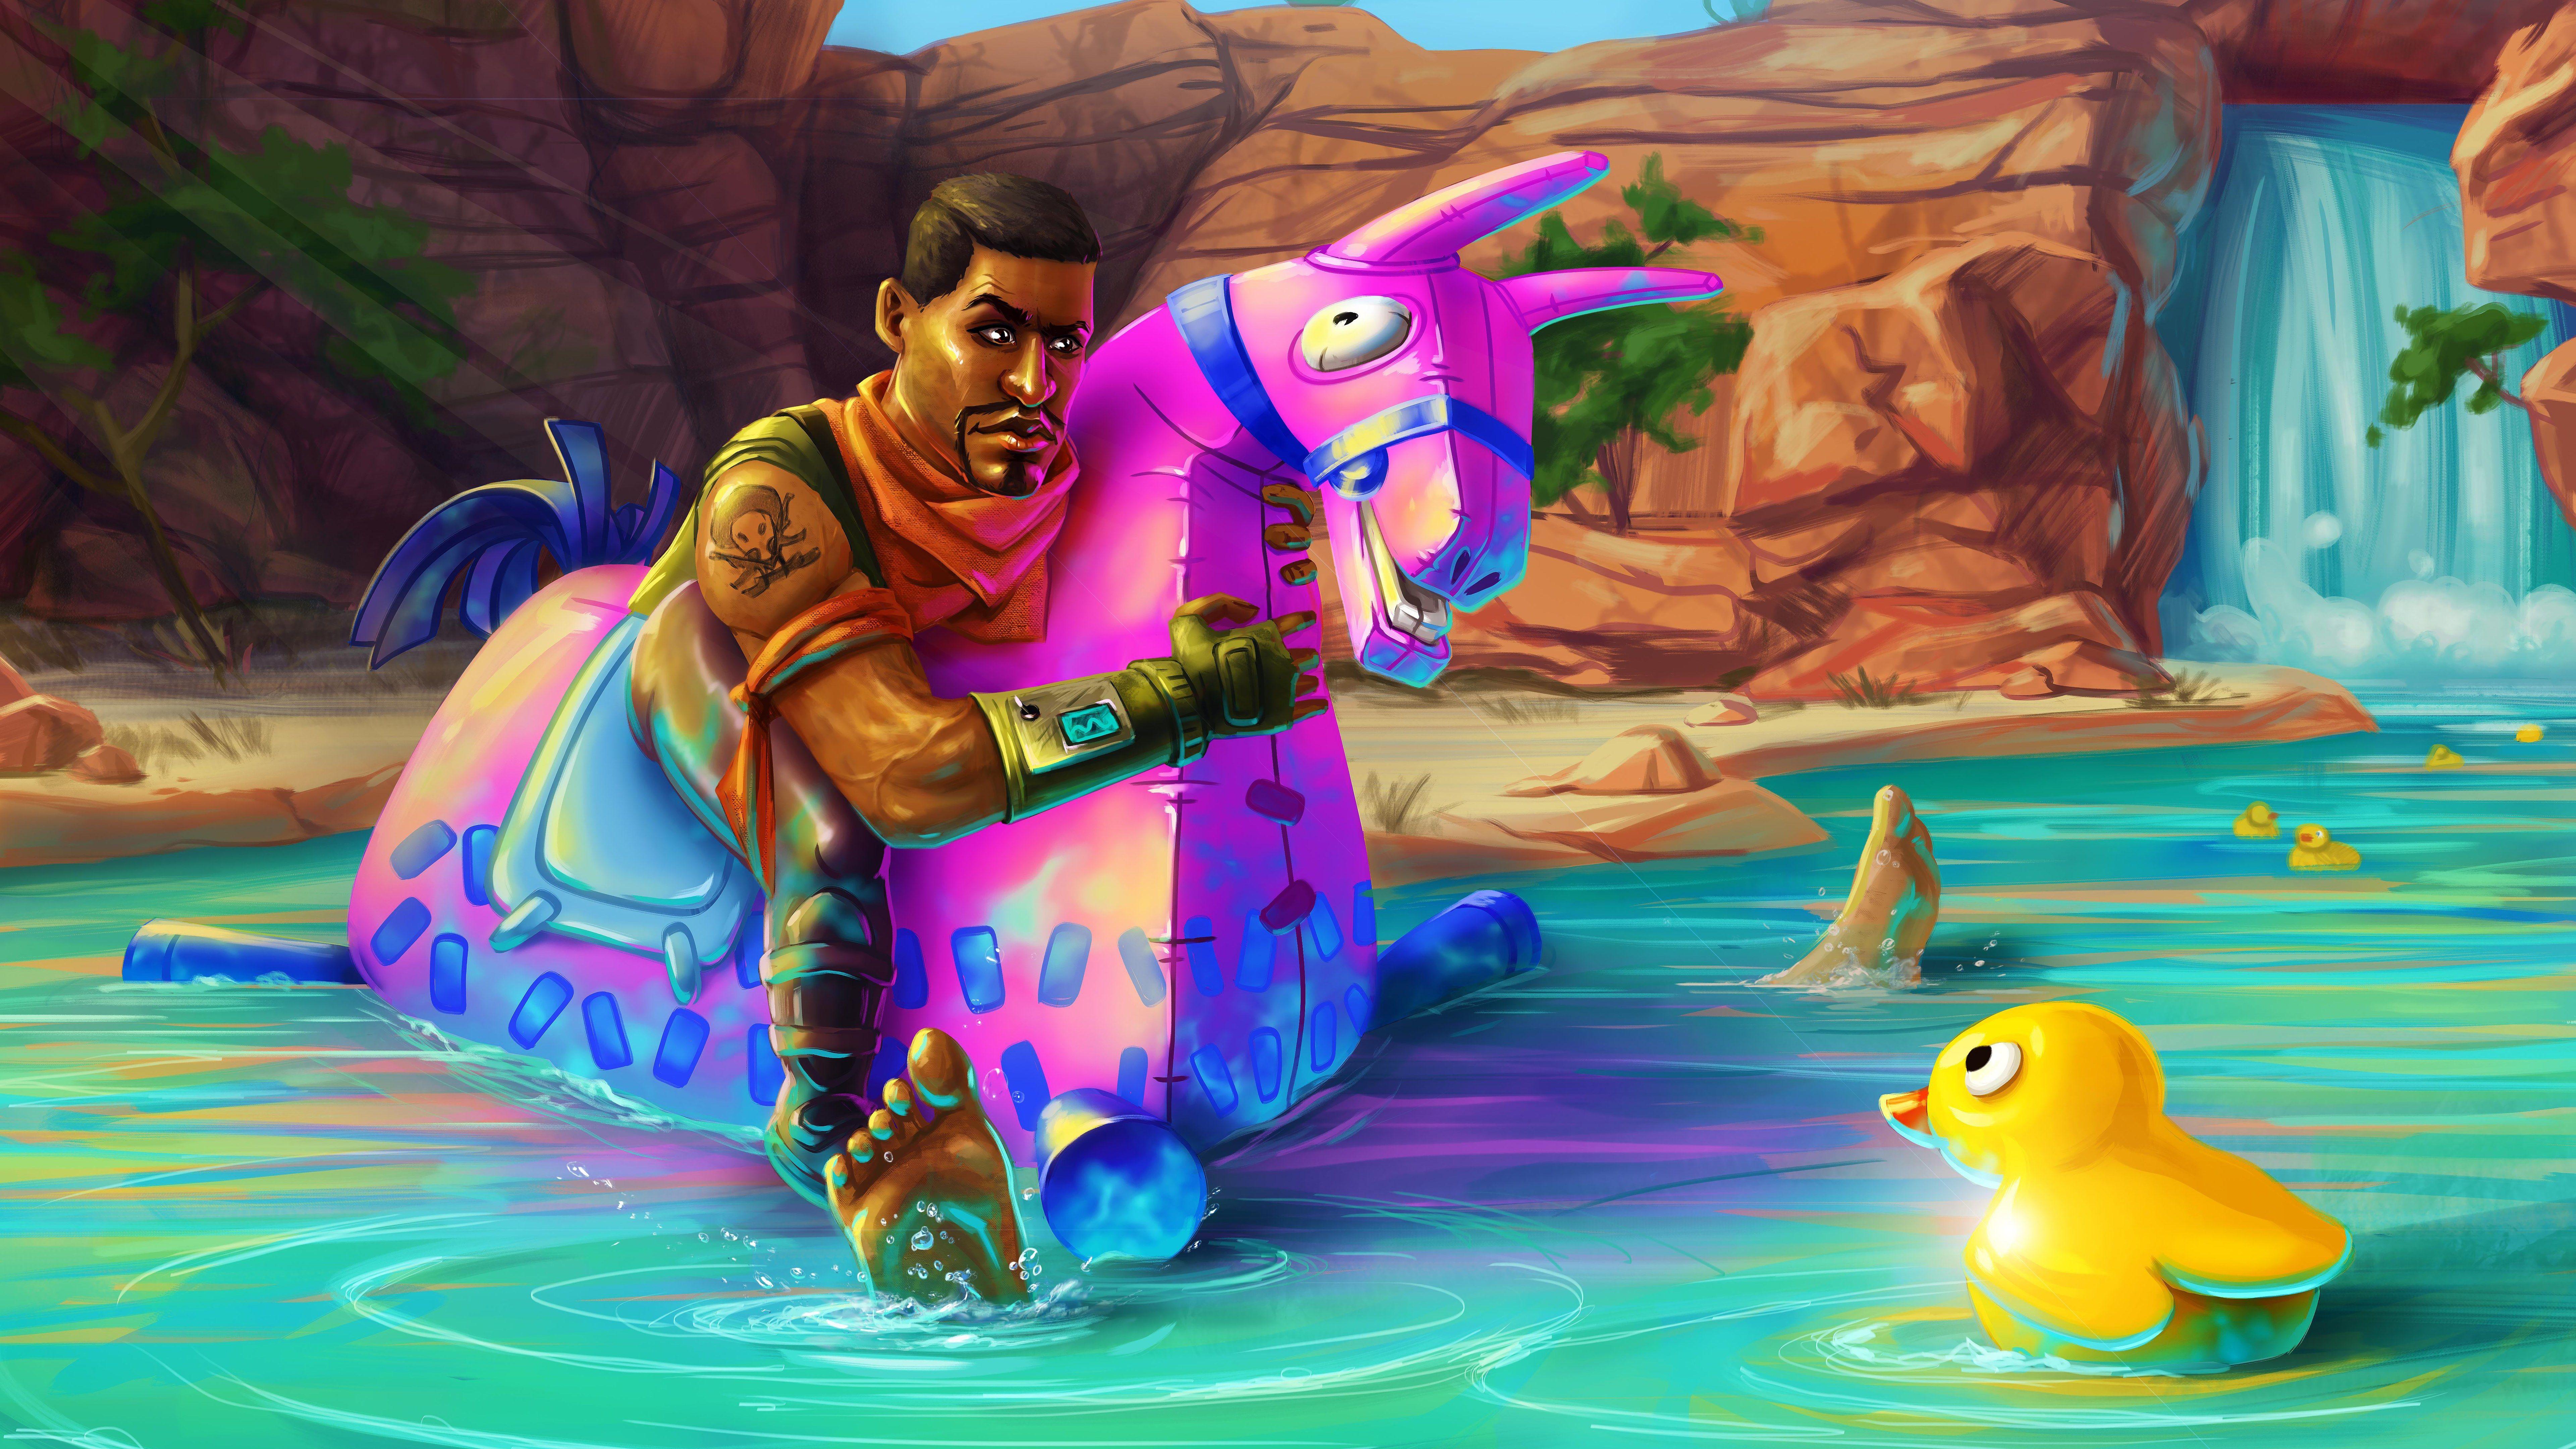 Giddy Up Fortnite Battle Royale Art 8k 25285 Art Black Art Pictures Fan Art